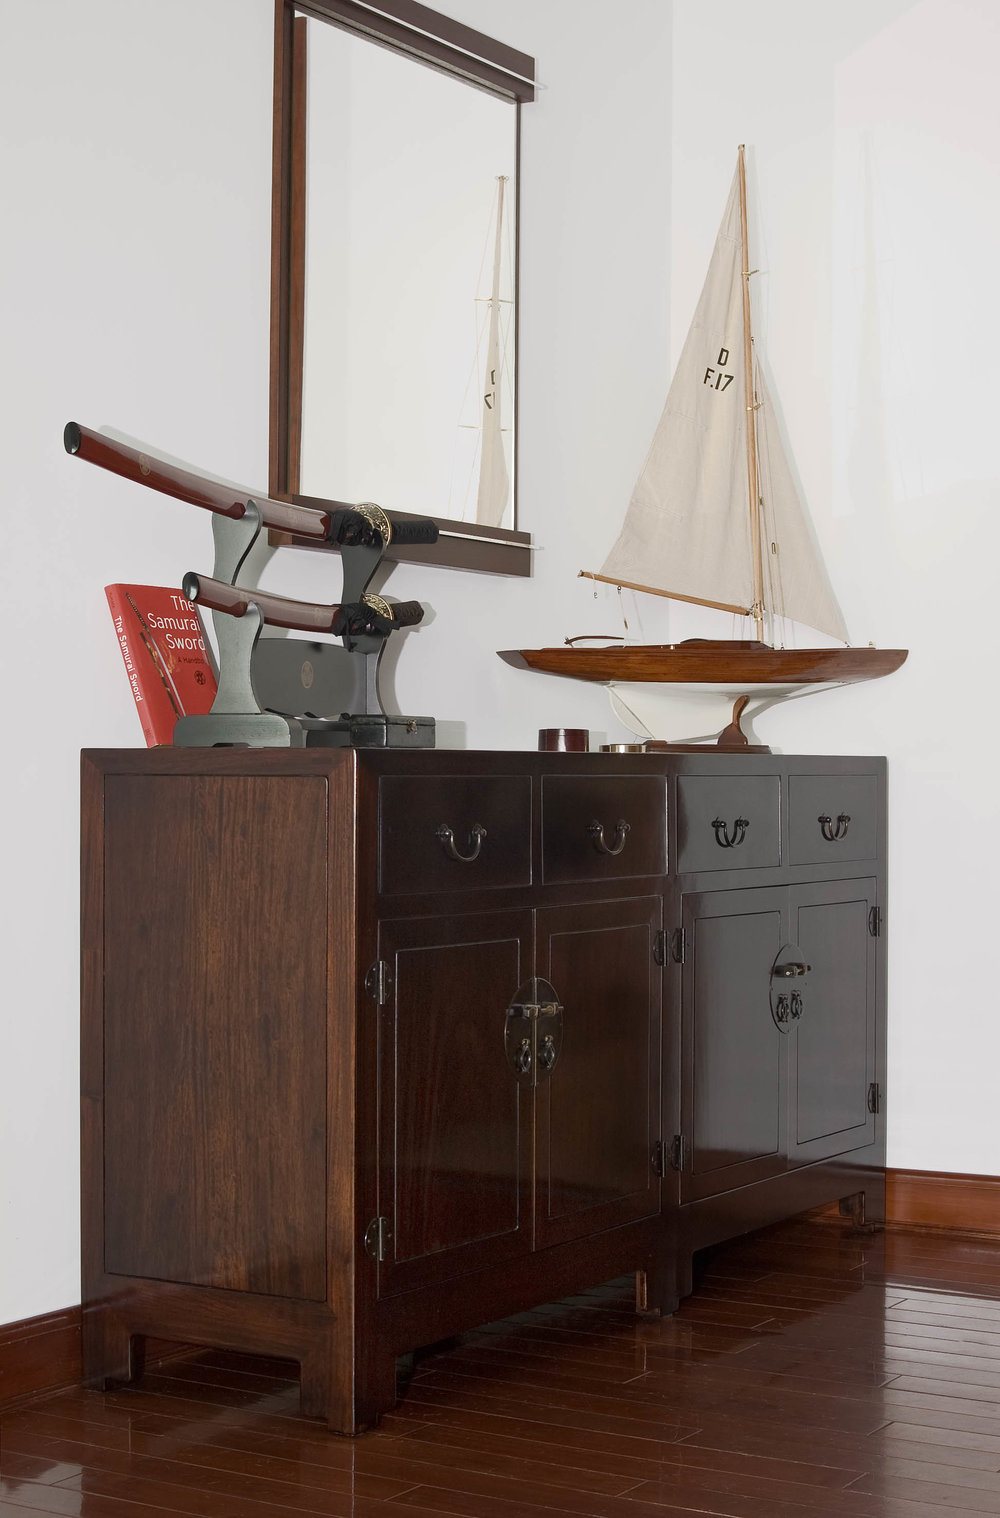 ....chinese ming style furniture : sideboard..中式明式家具 : 餐柜....